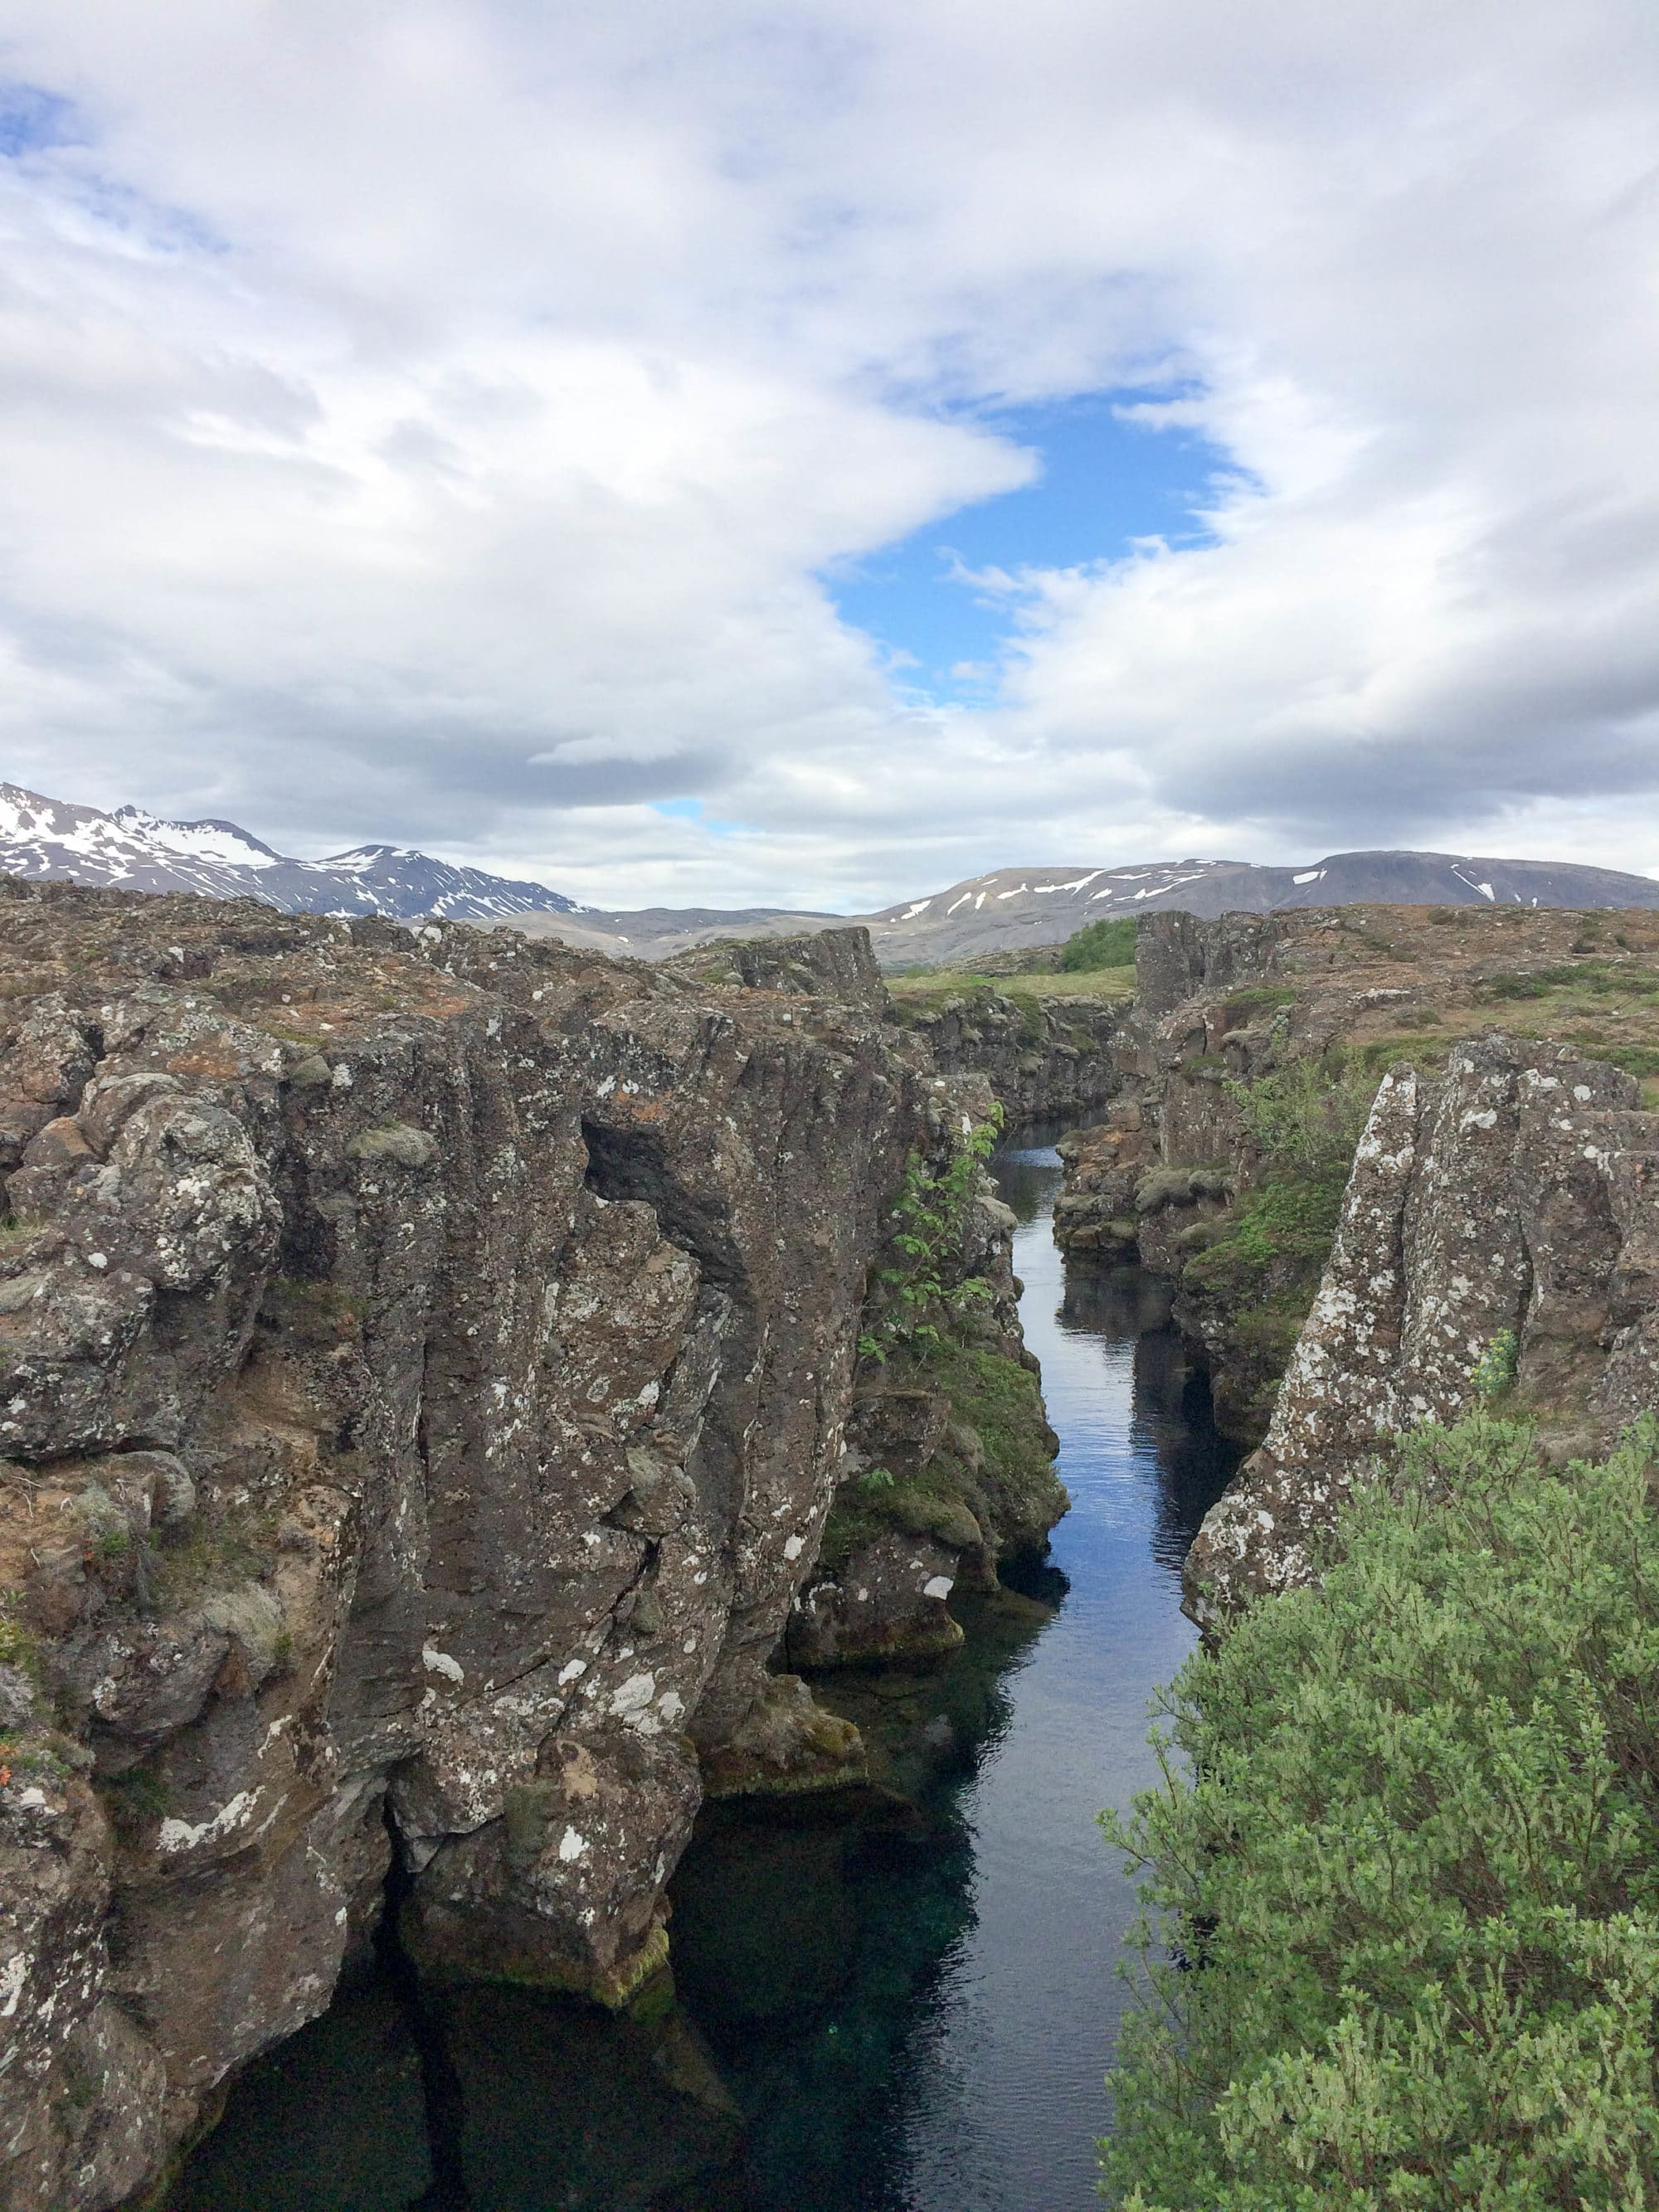 Tectonic Plates Meeting Iceland | Umami Girl